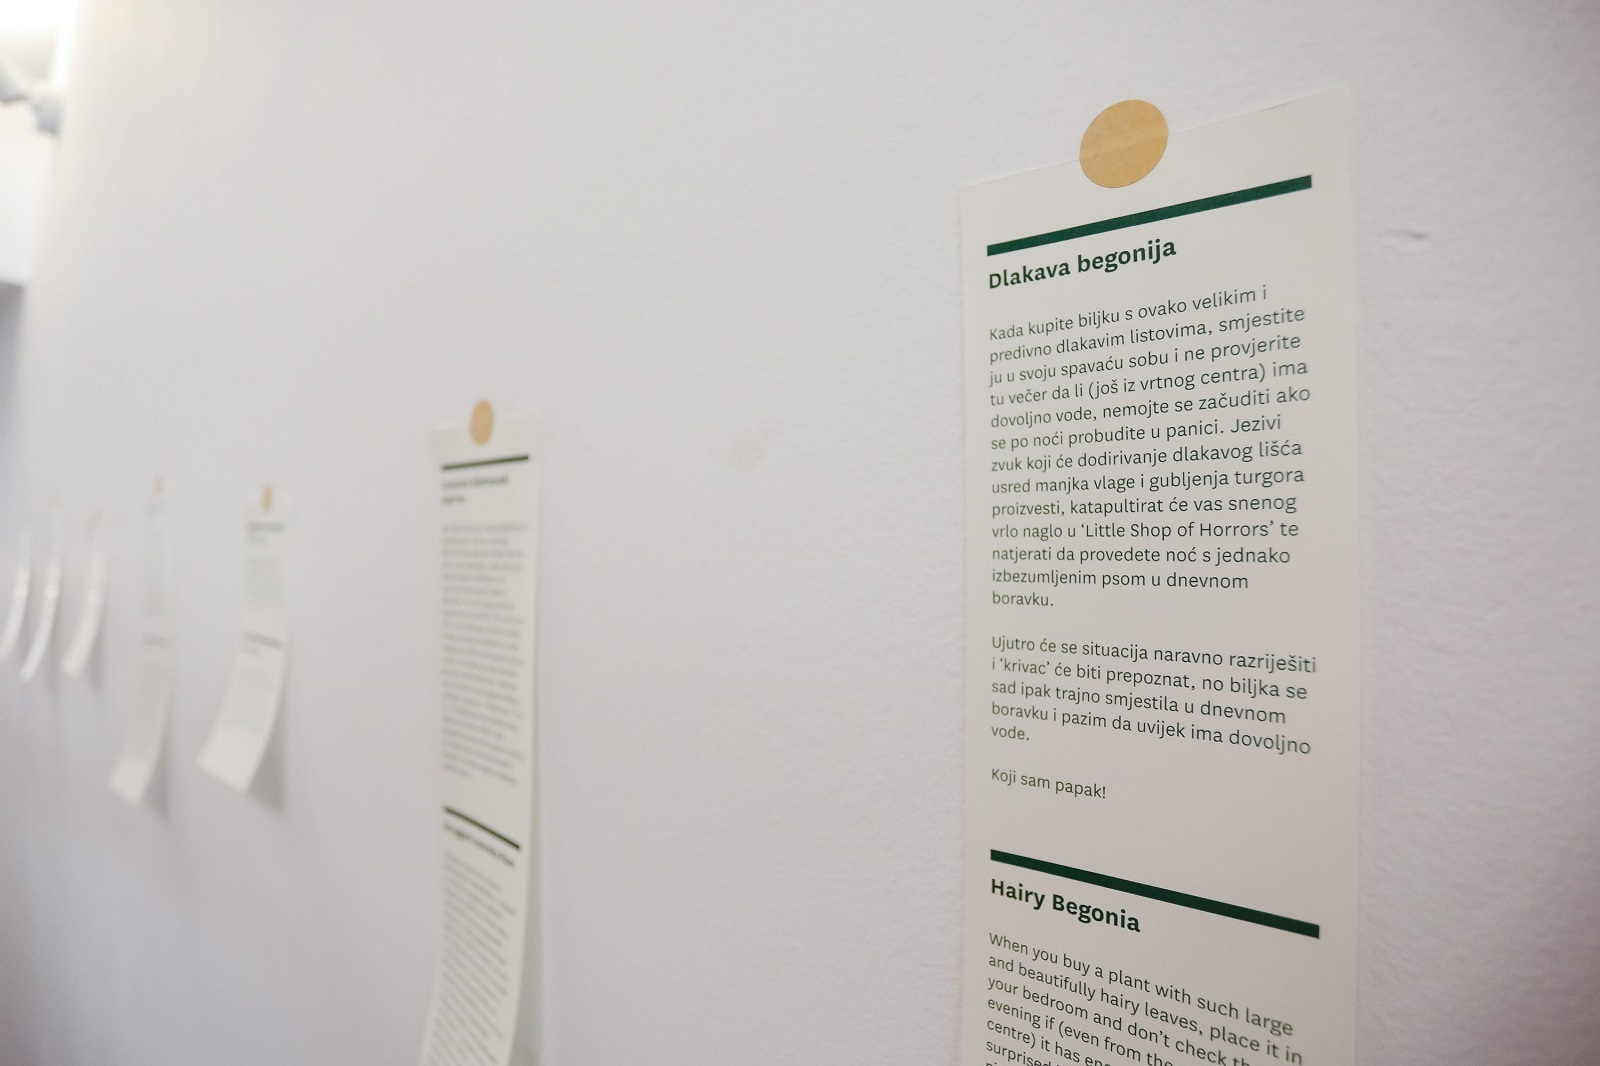 Zagreb, 290720. Cirilometodska ulica. Hotel za biljke otvoren je u sklopu Muzeja prekinutih veza.  Na fotografiji: zelene price.  Foto: Marko Todorov / CROPIX